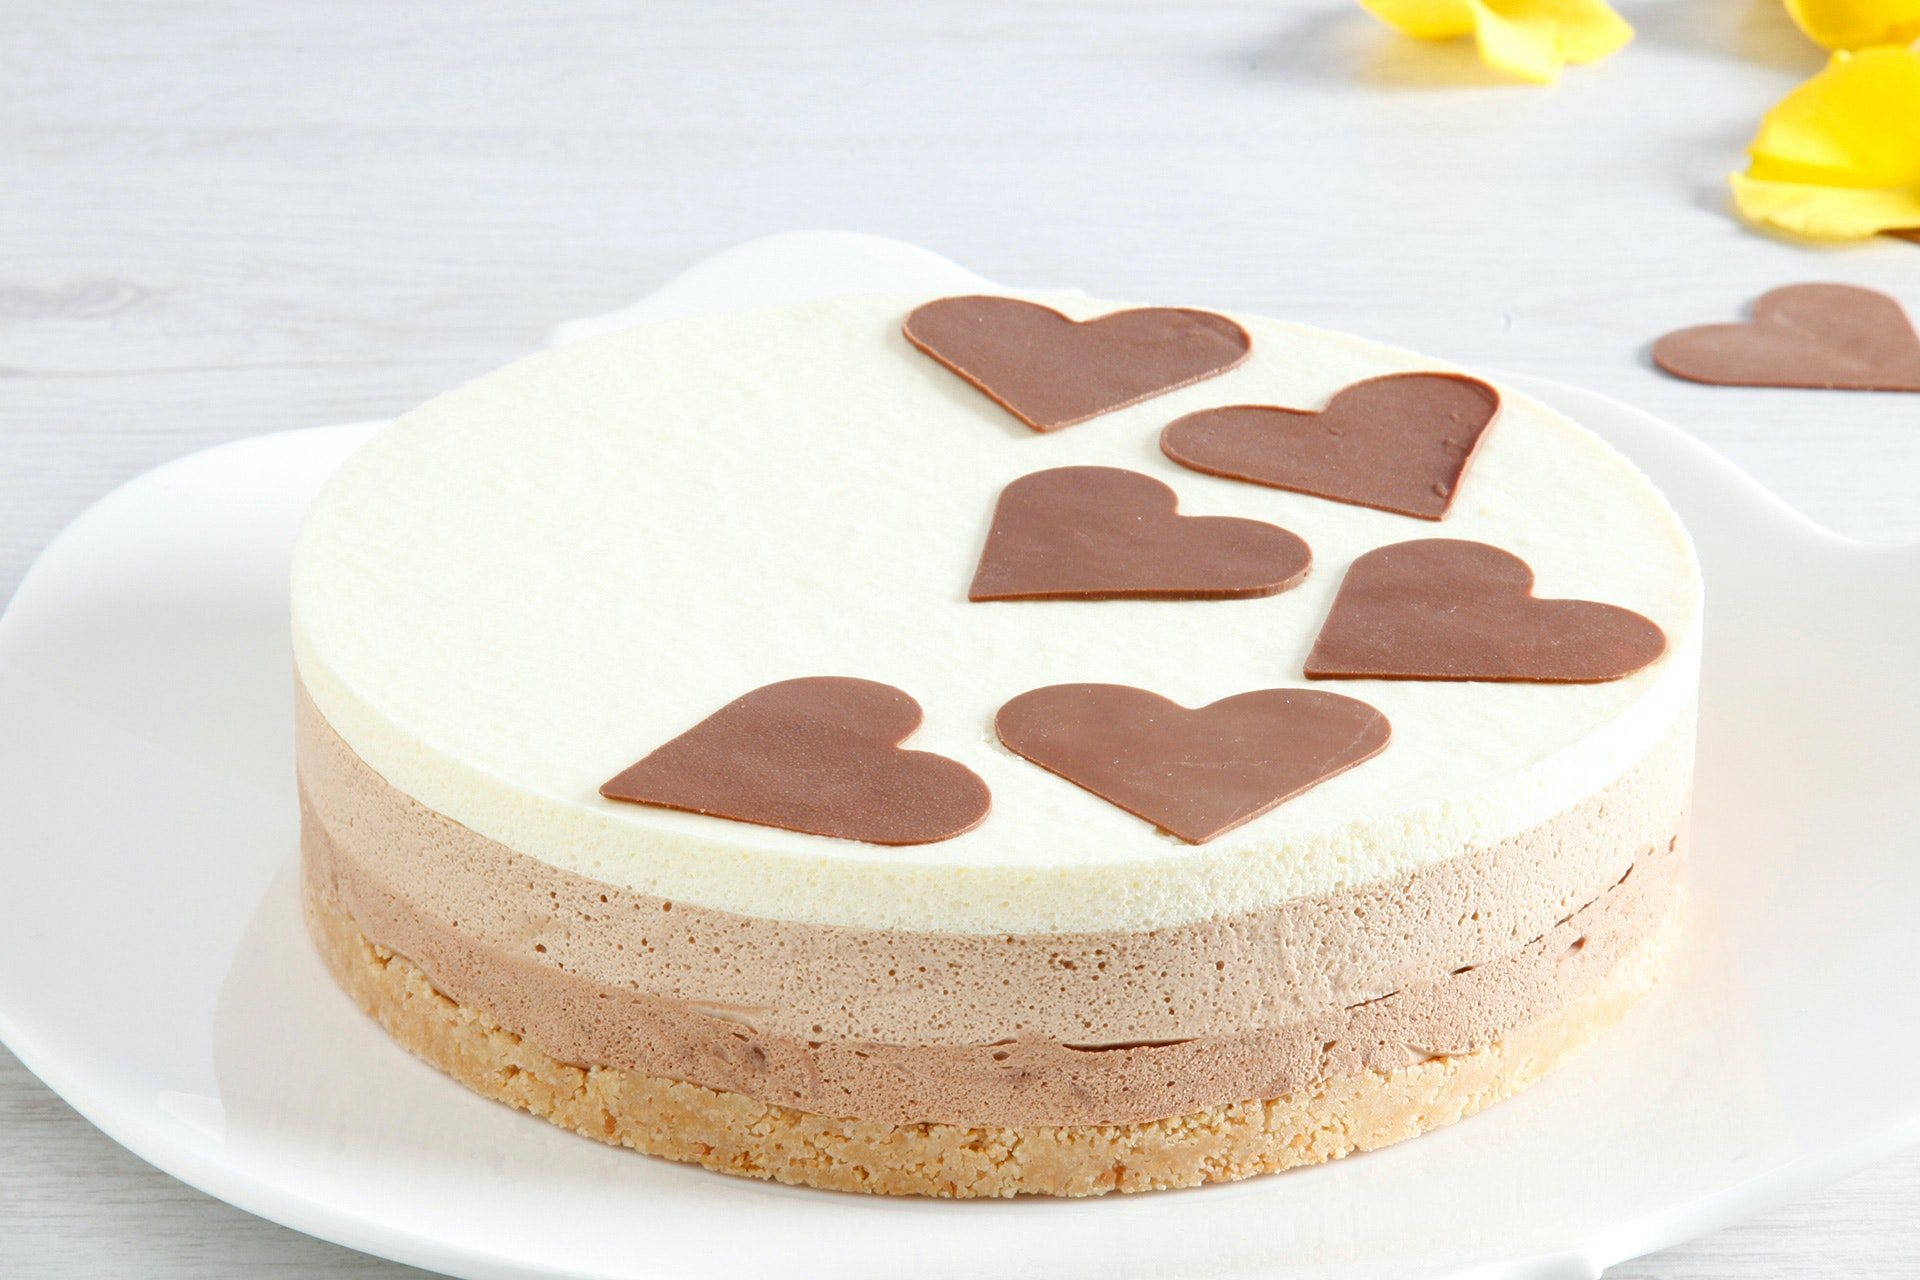 Torta ai tre cioccolati - Parmalat